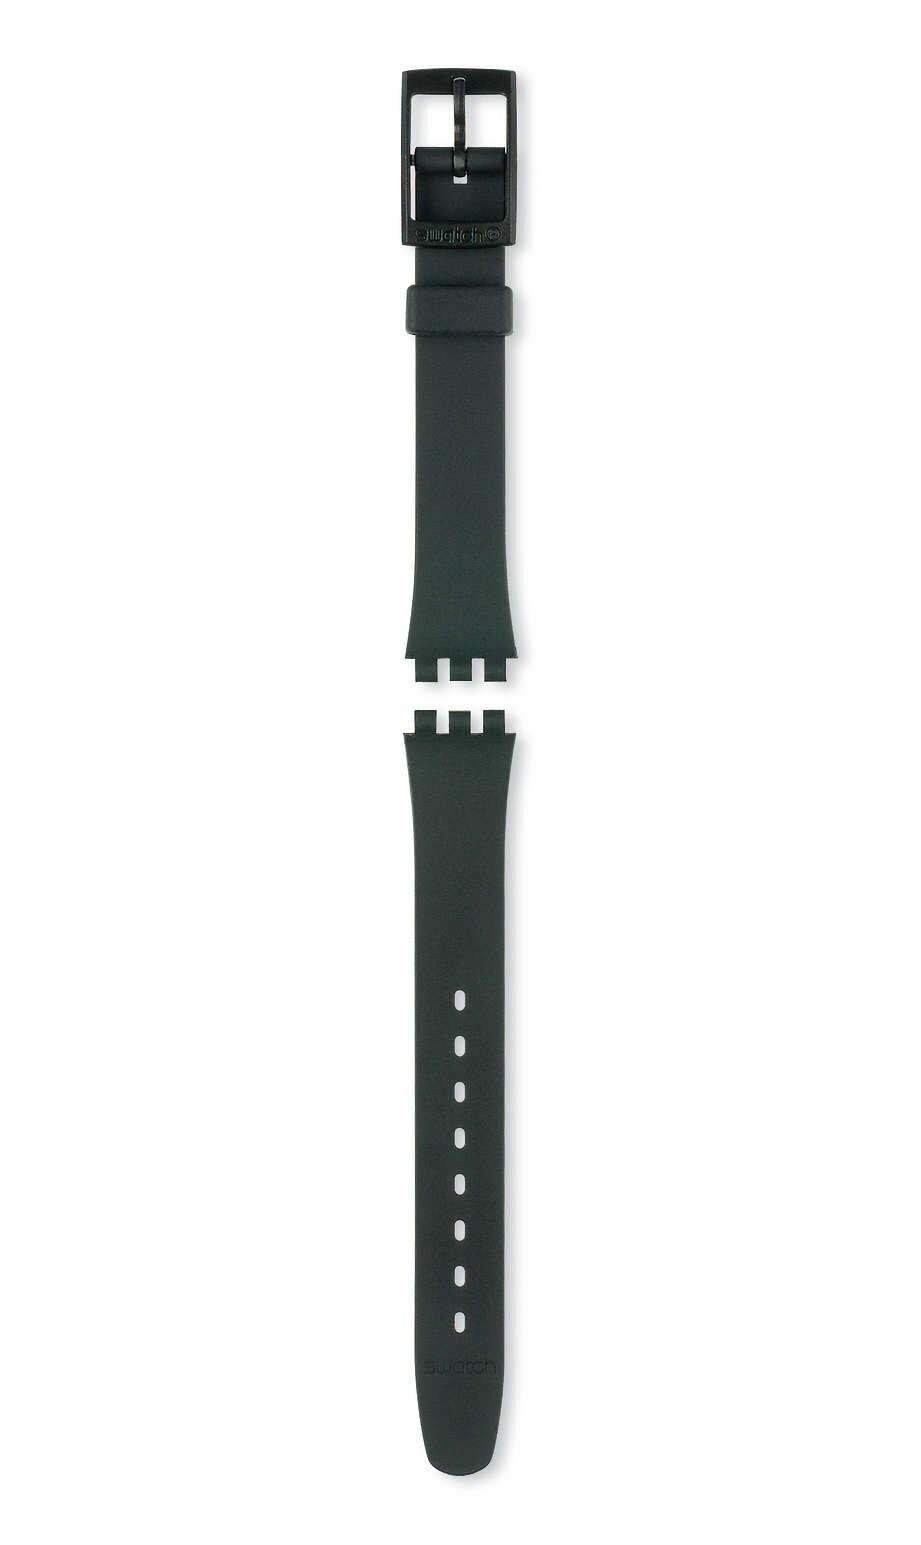 Swatch - BLACK PLASTIC STRAP - 1